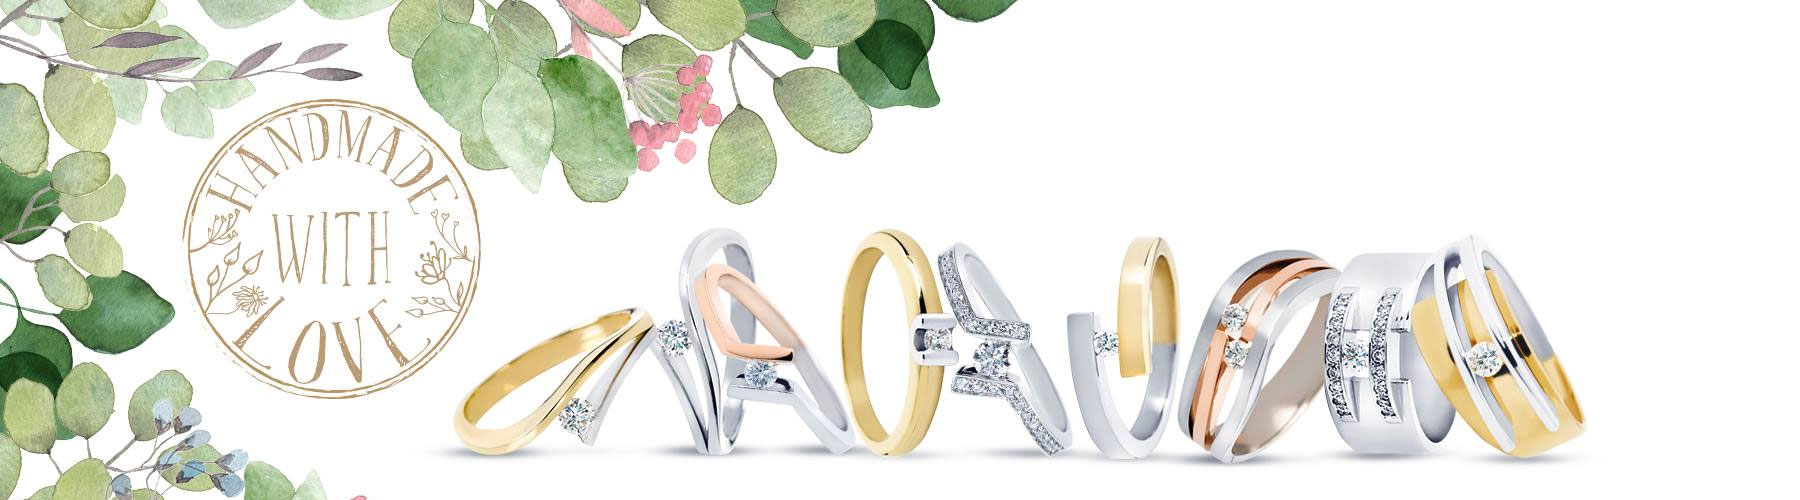 R&C groeibriljant briljant sieraden Wolters Juweliers Coevorden Emmen Hoogeveen Hardenberg